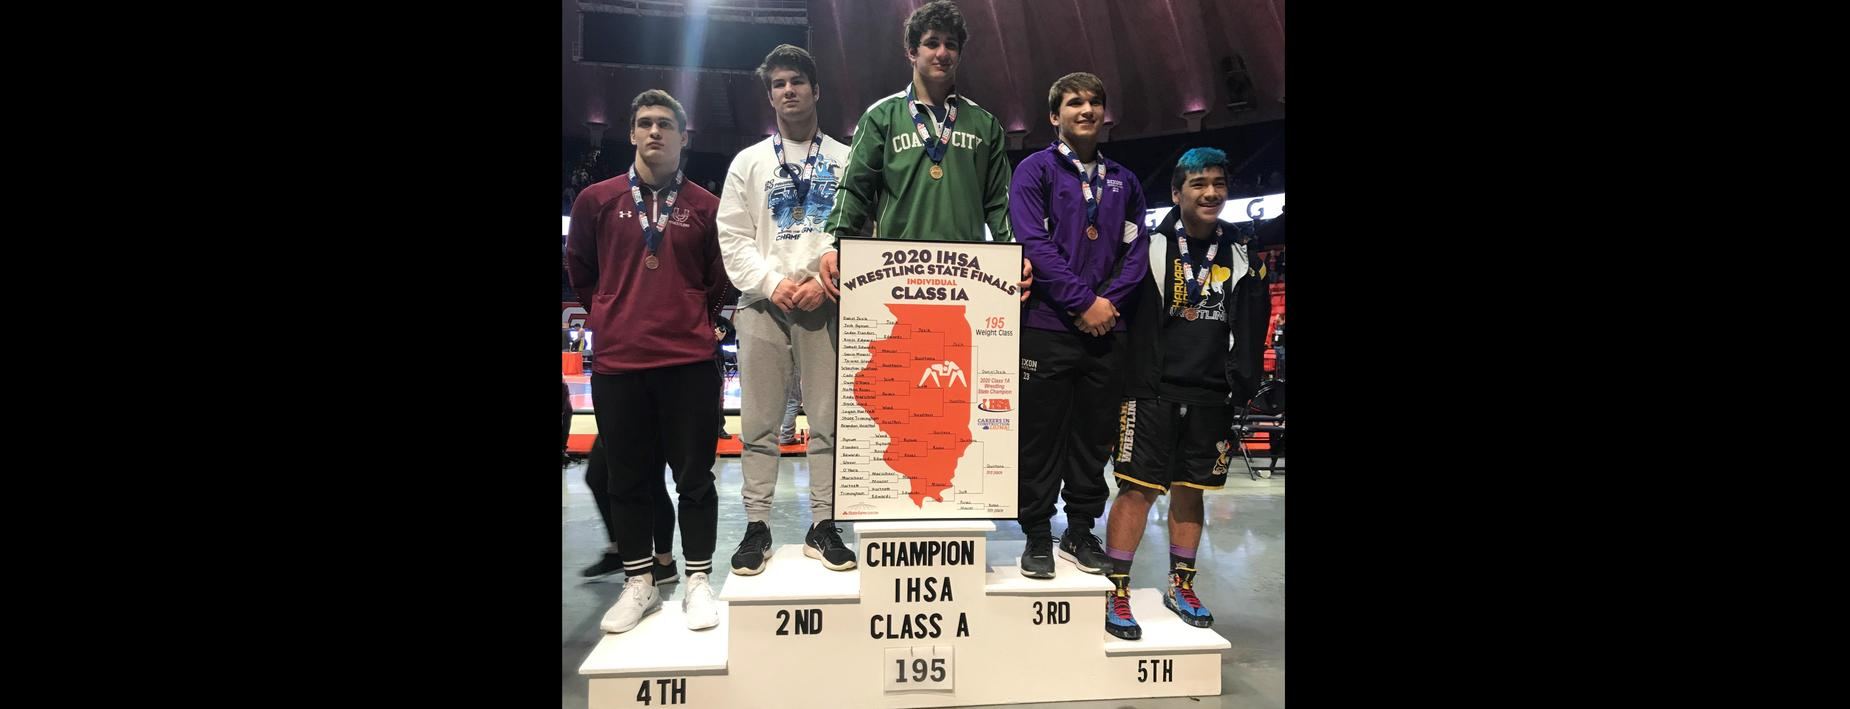 195 State Champion